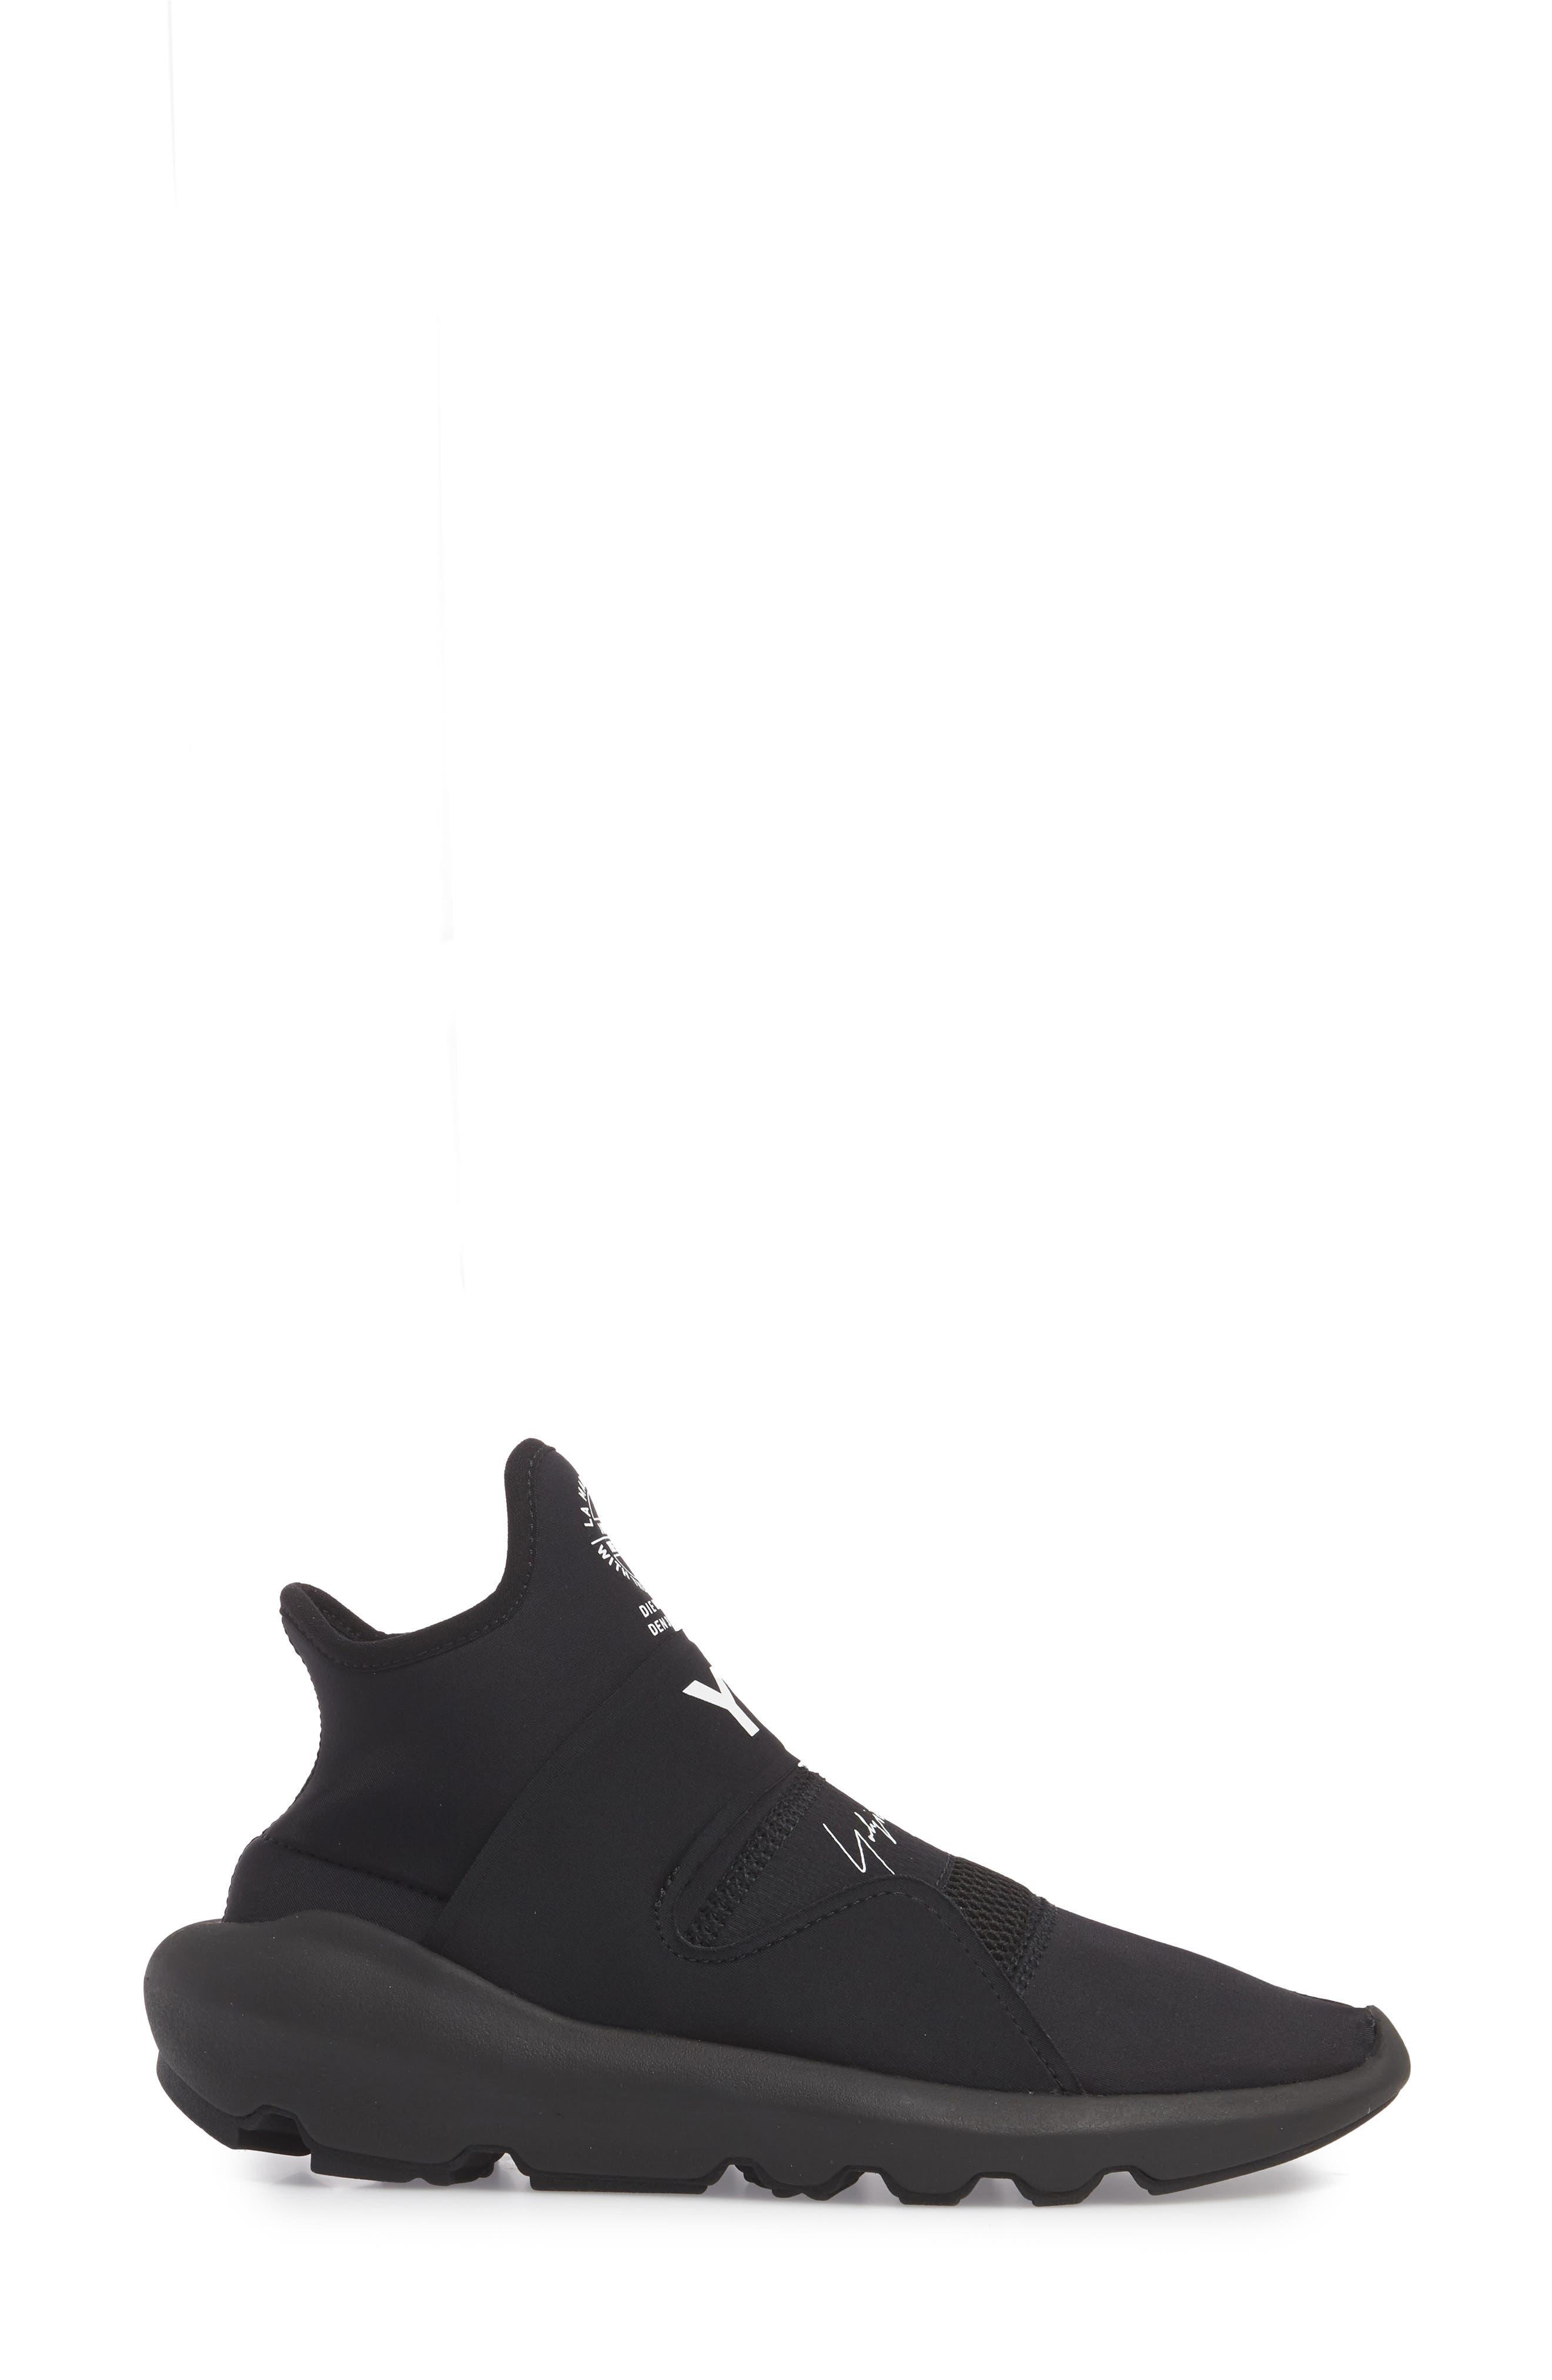 Superbou Sneaker,                             Alternate thumbnail 3, color,                             Black / Core White